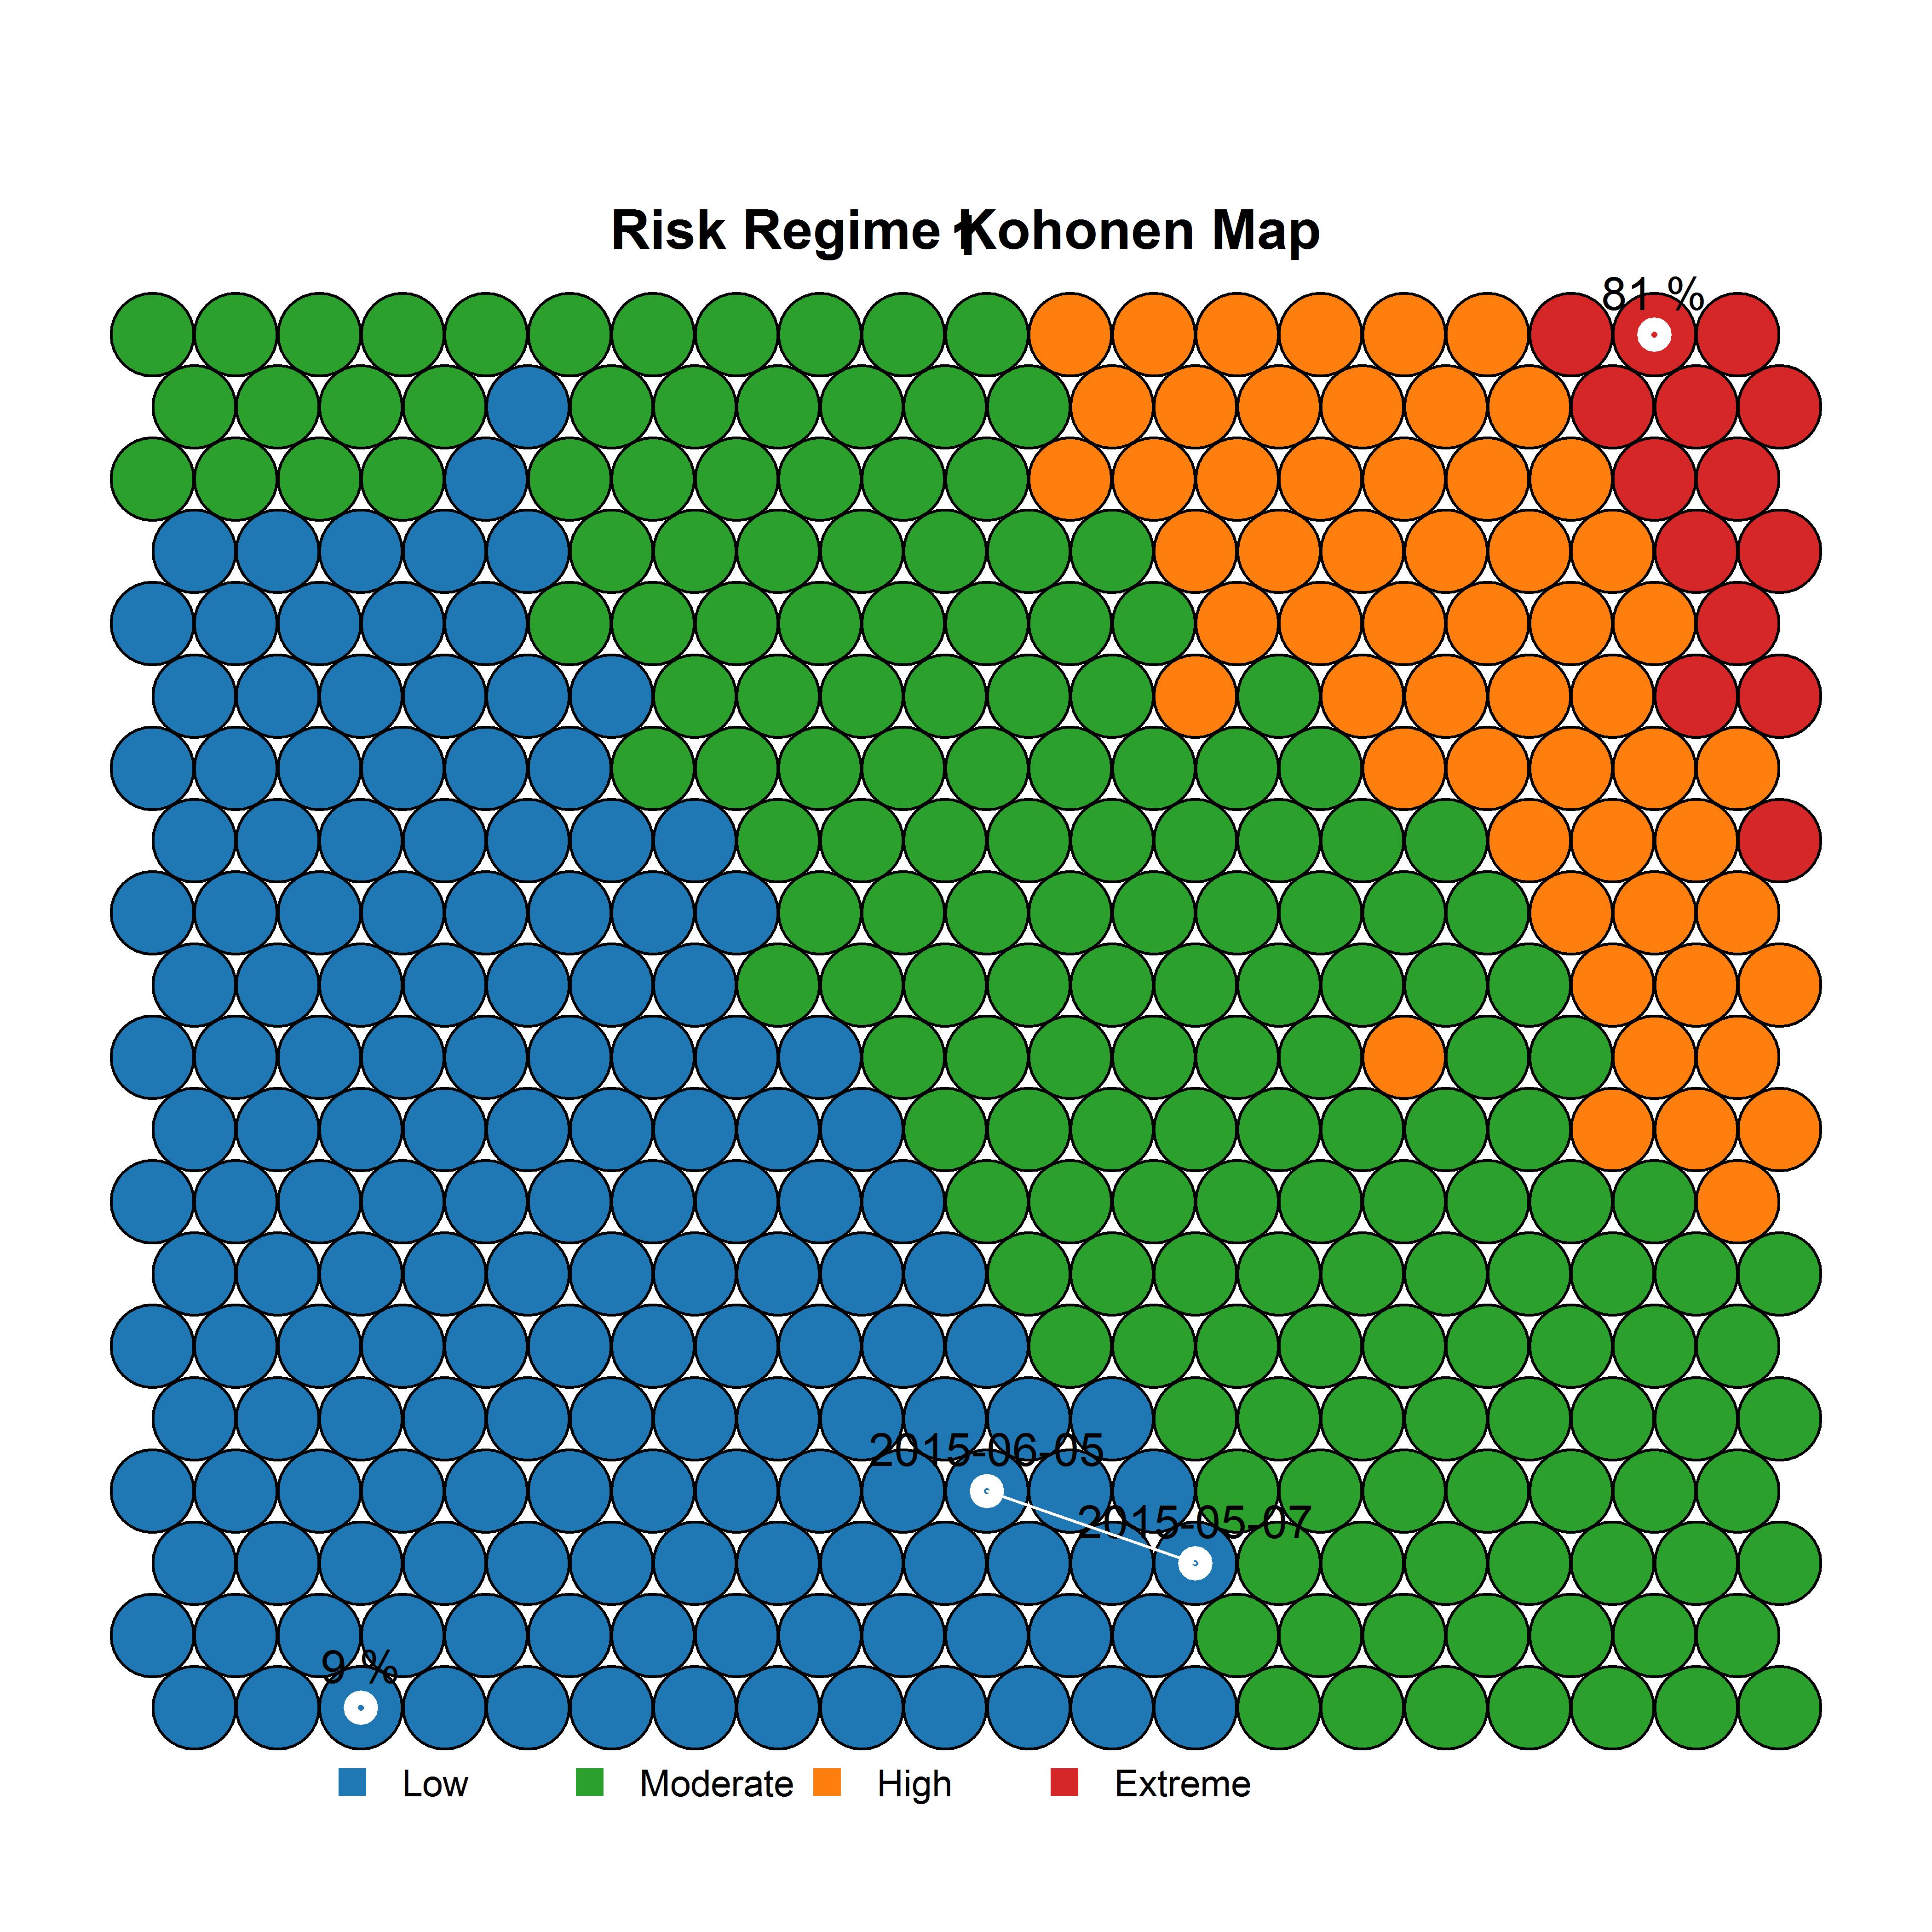 plot of chunk SOM_chart